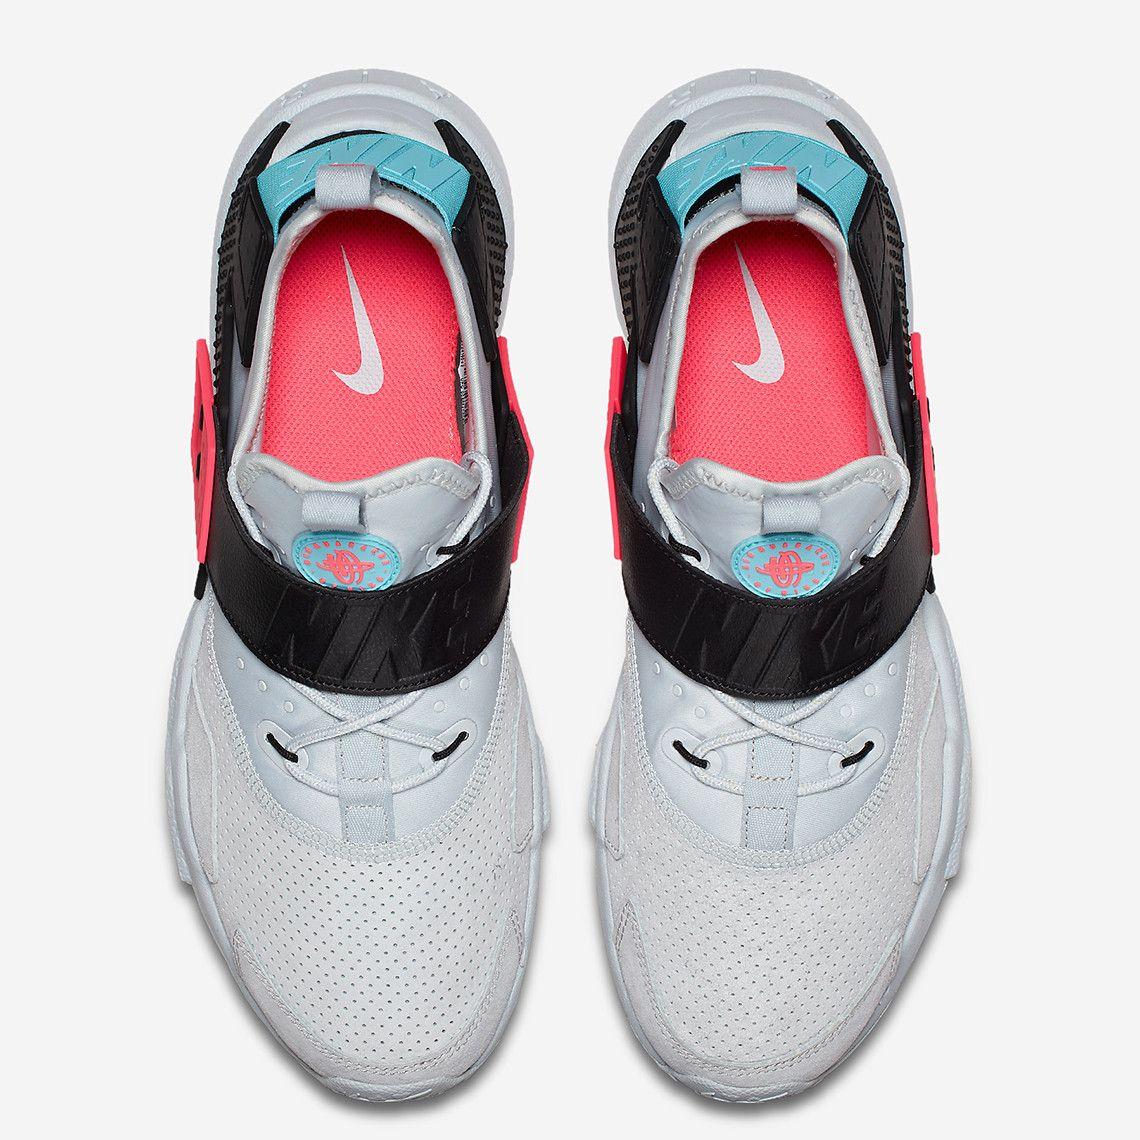 6d861d7b5793d Nike Air Huarache Drift